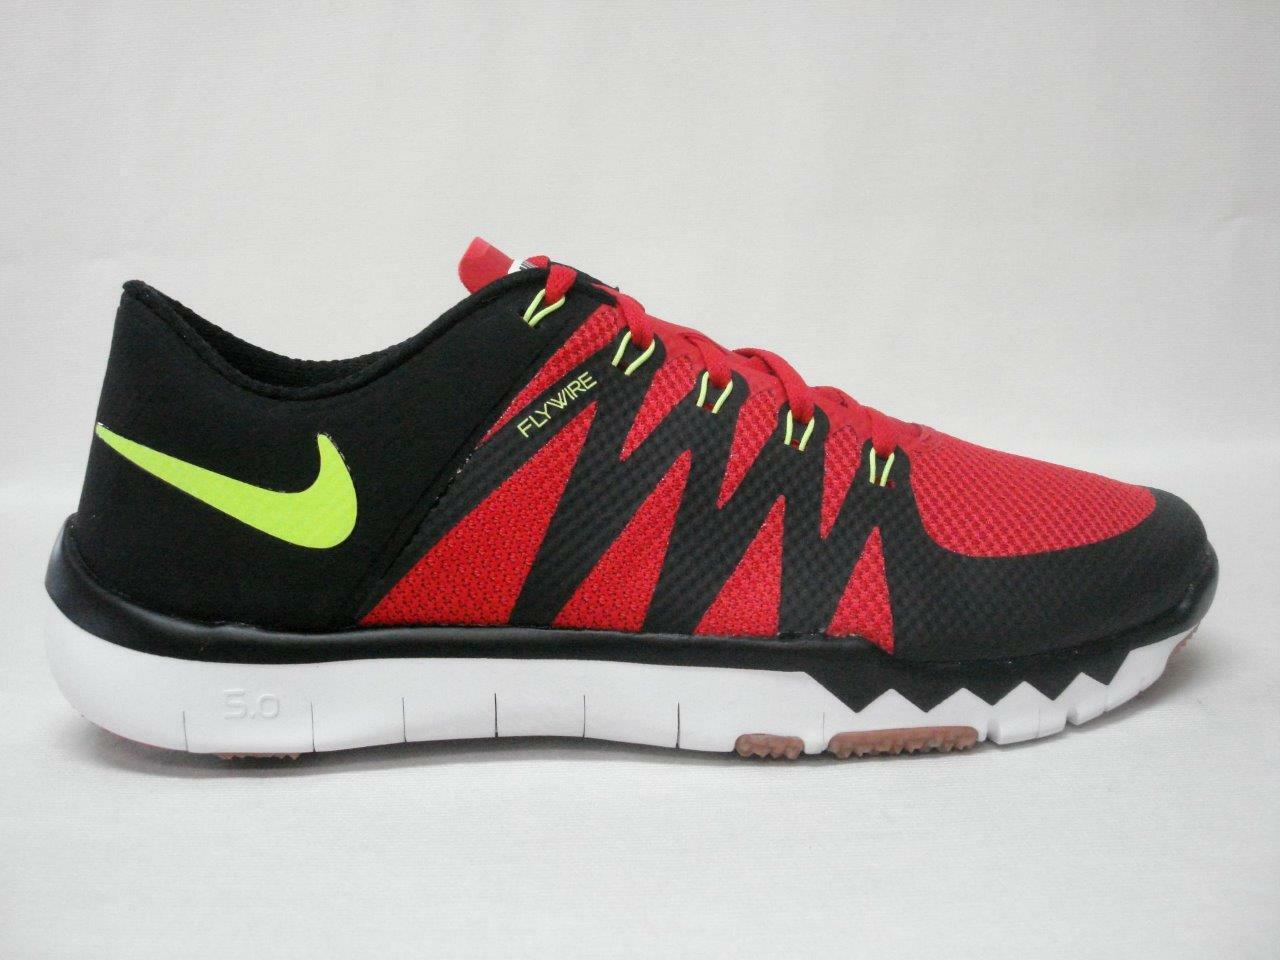 on sale 341dc 6b043 NIB Nike Free Trainer 5 V6 V6 V6 Hombre zapato 12 Rojo Negro ~ dulce  buscando